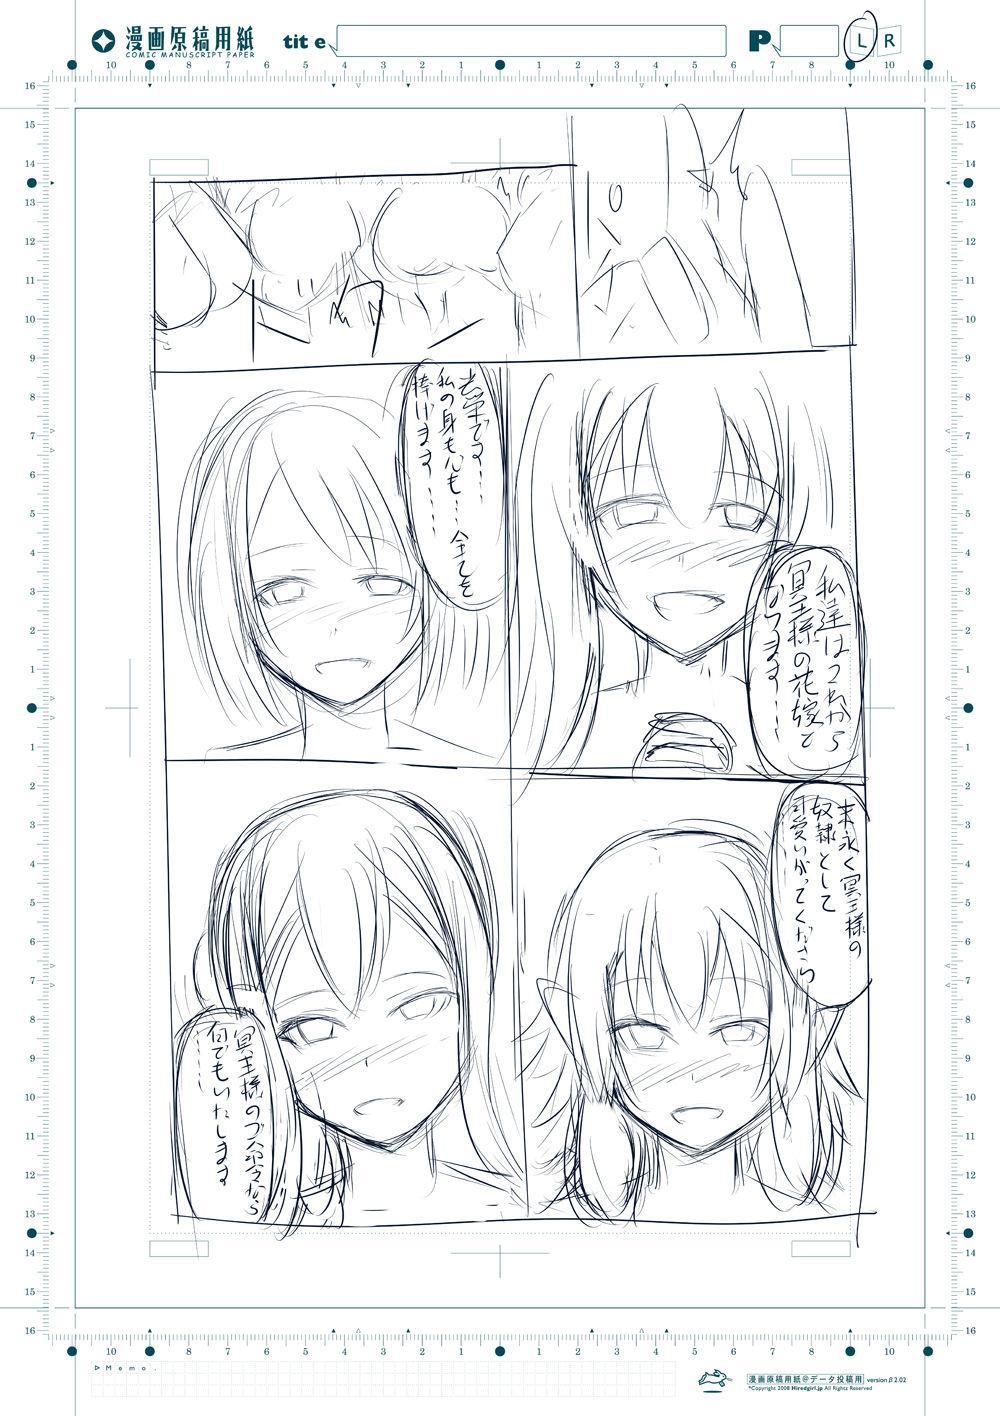 Goblin Slayer Sennou Manga 23